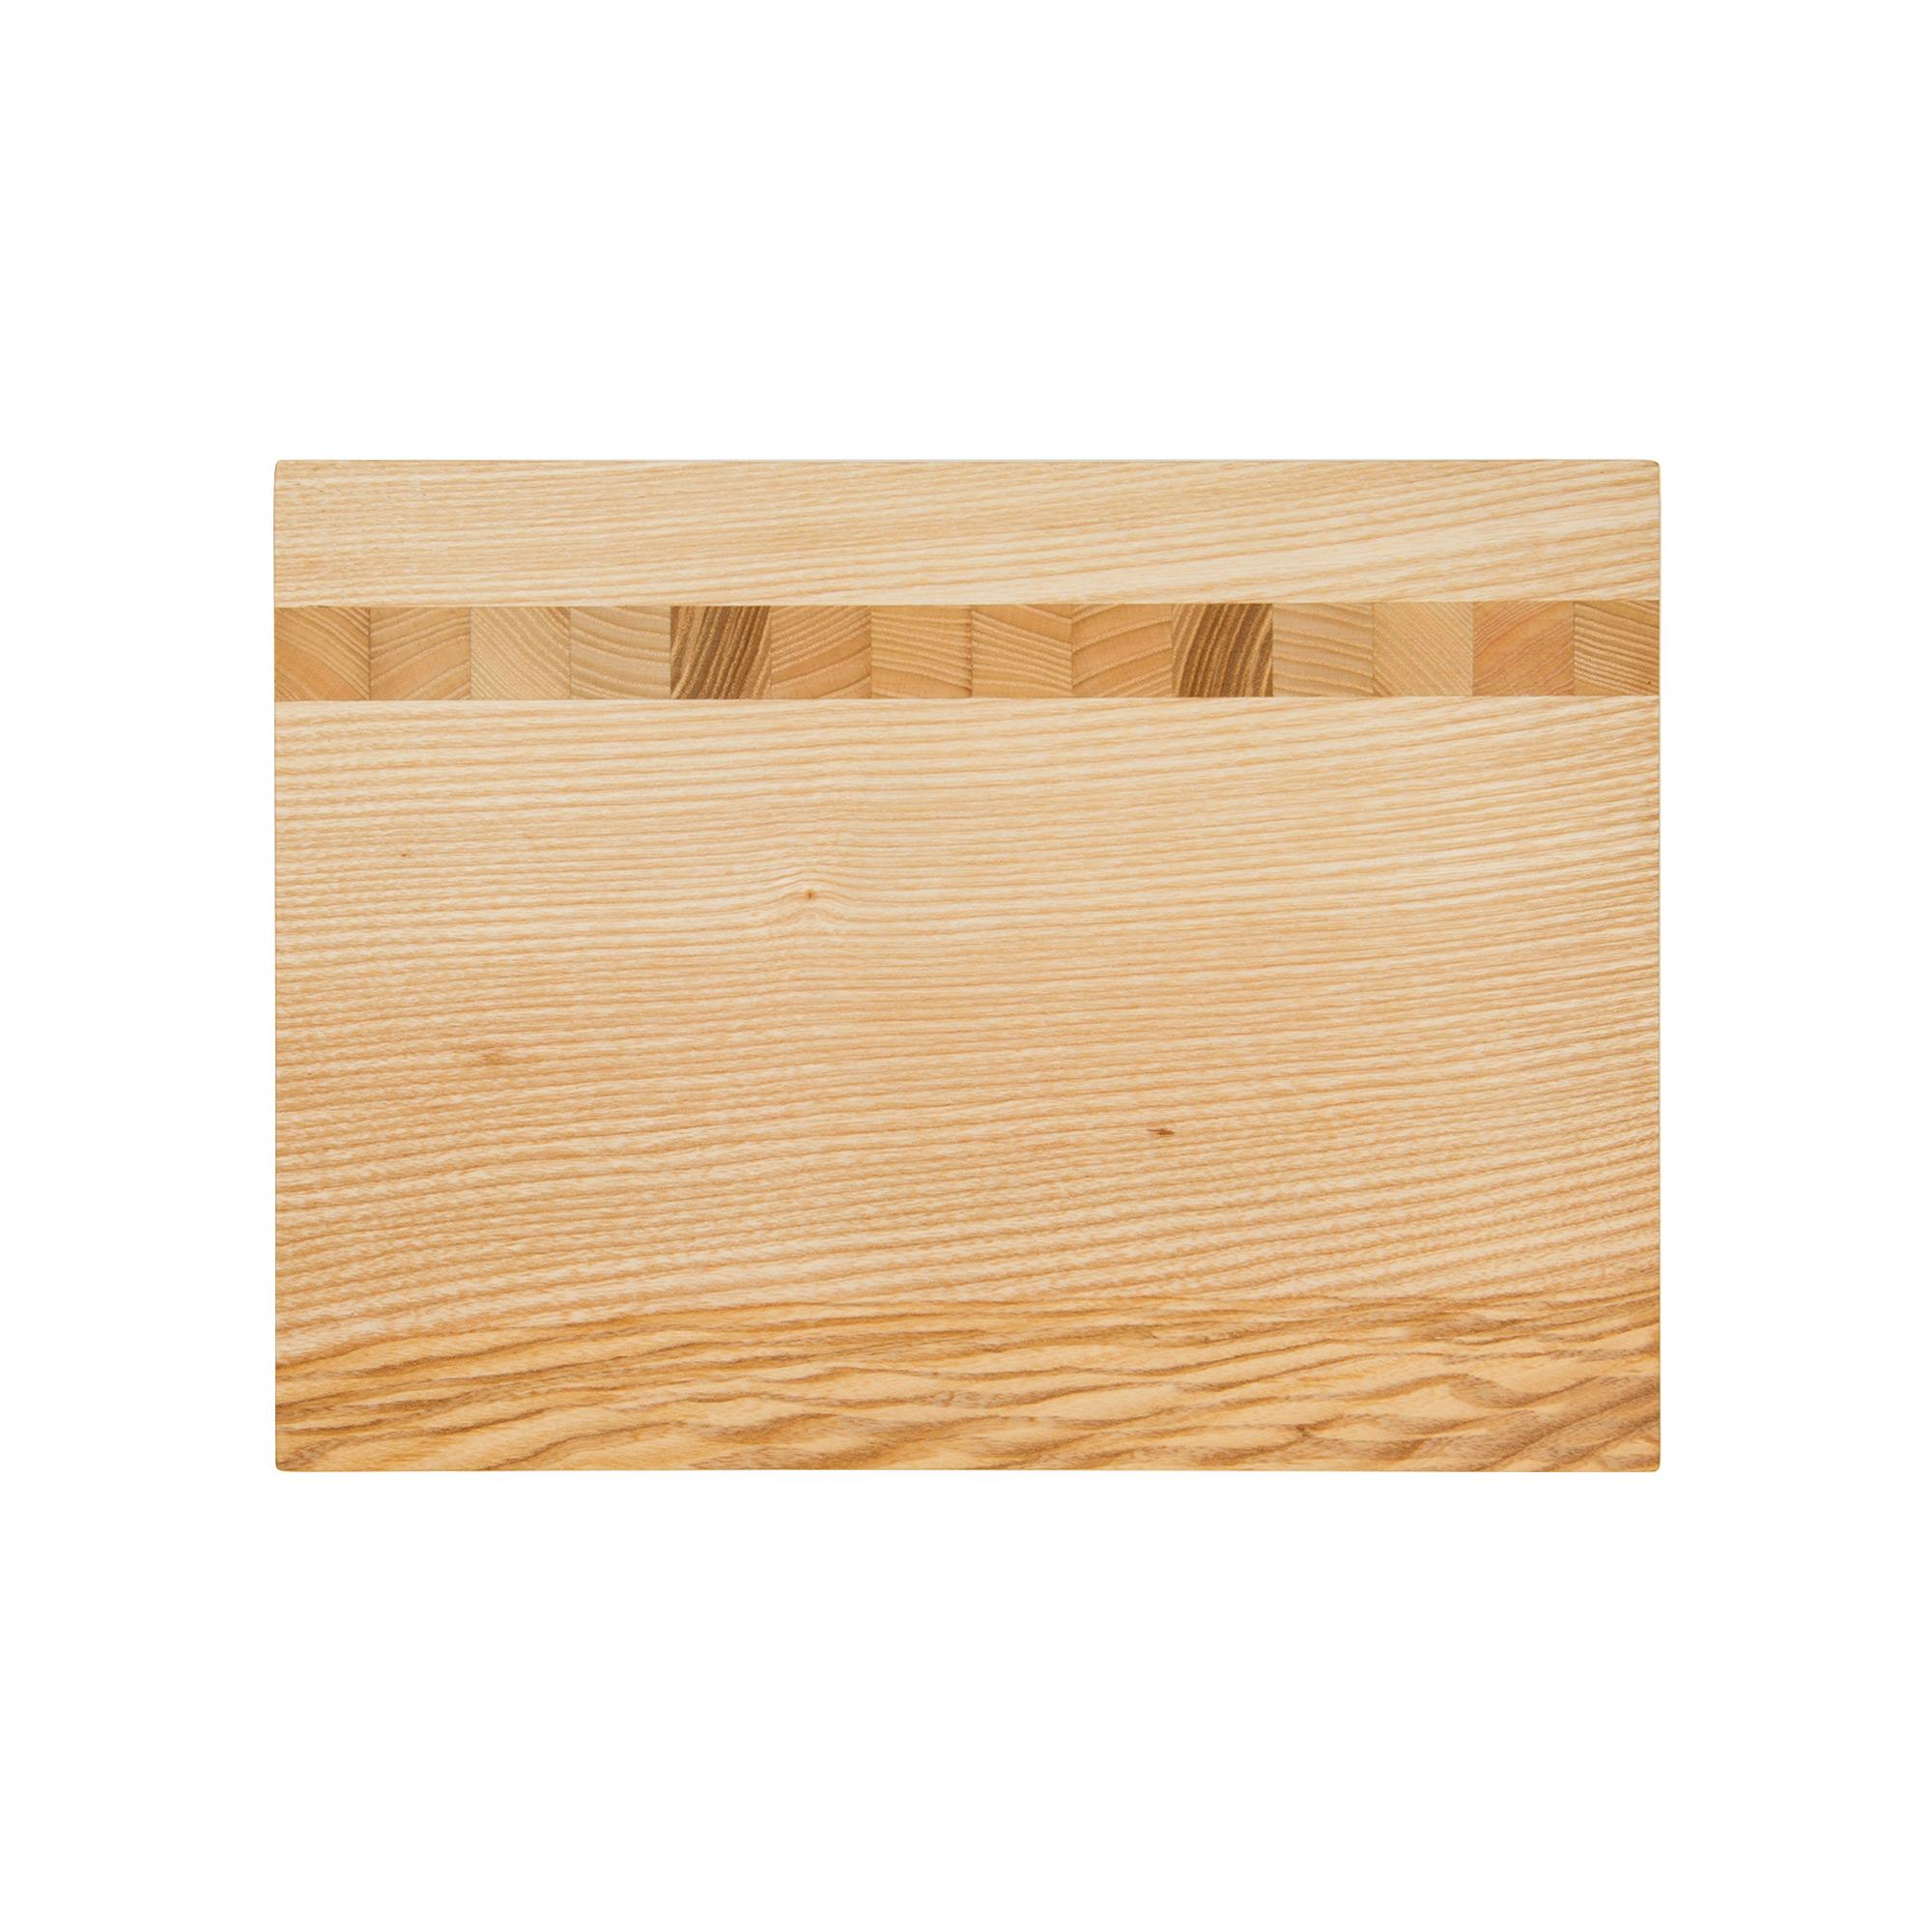 planche-a-decouper-bois-massif-DSC_2409-mon-julo